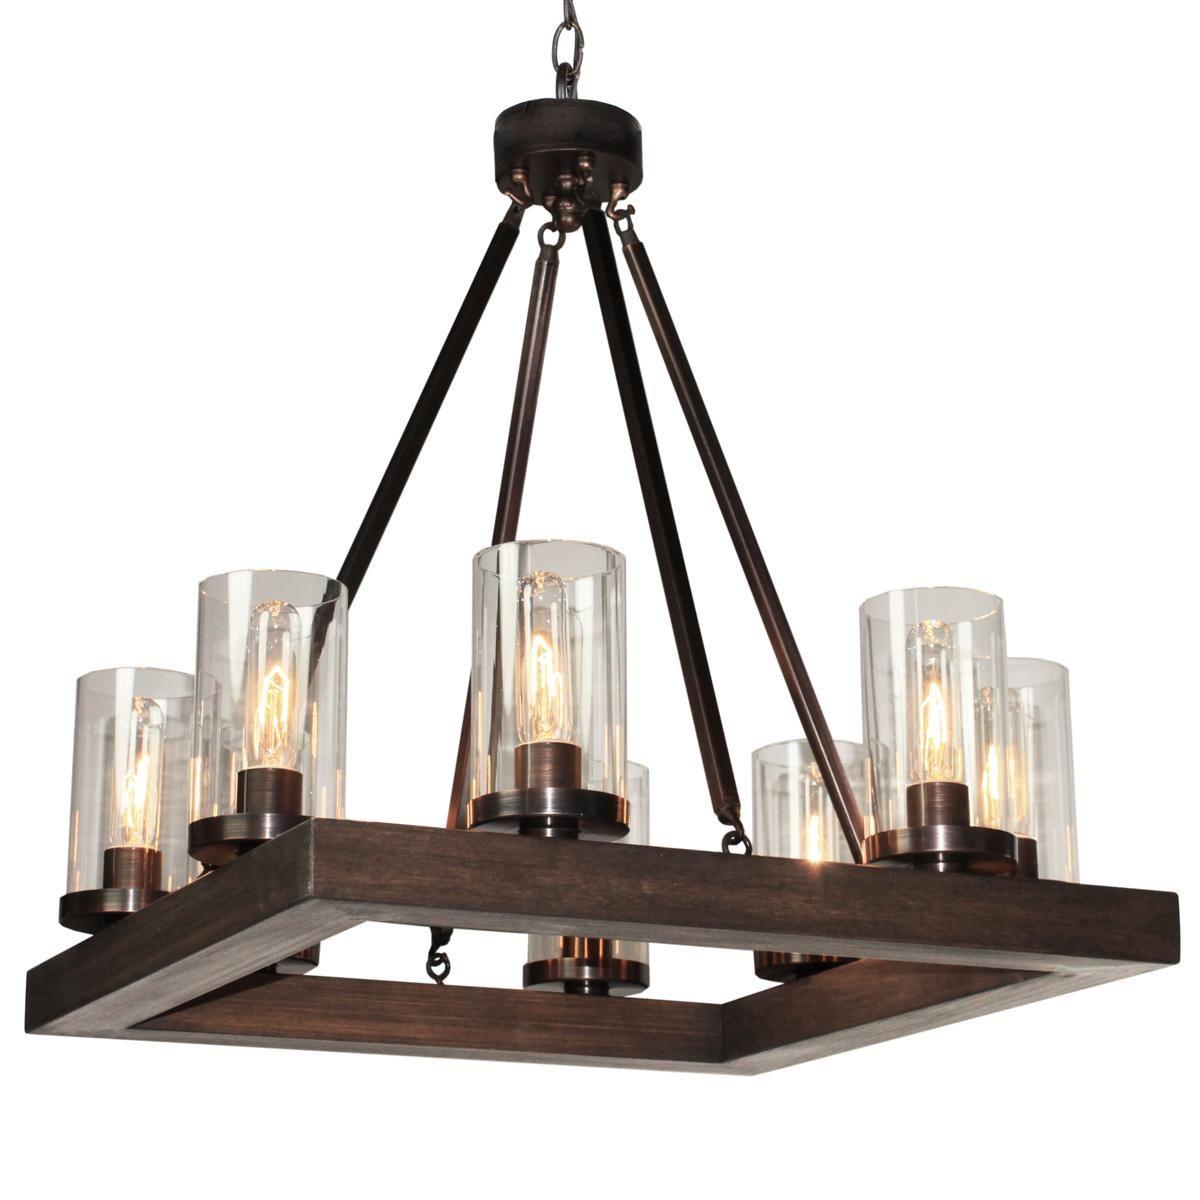 amp custom granite chandelier light kitchen shaped rustic with u complex counters digs rectangular arturo zillow